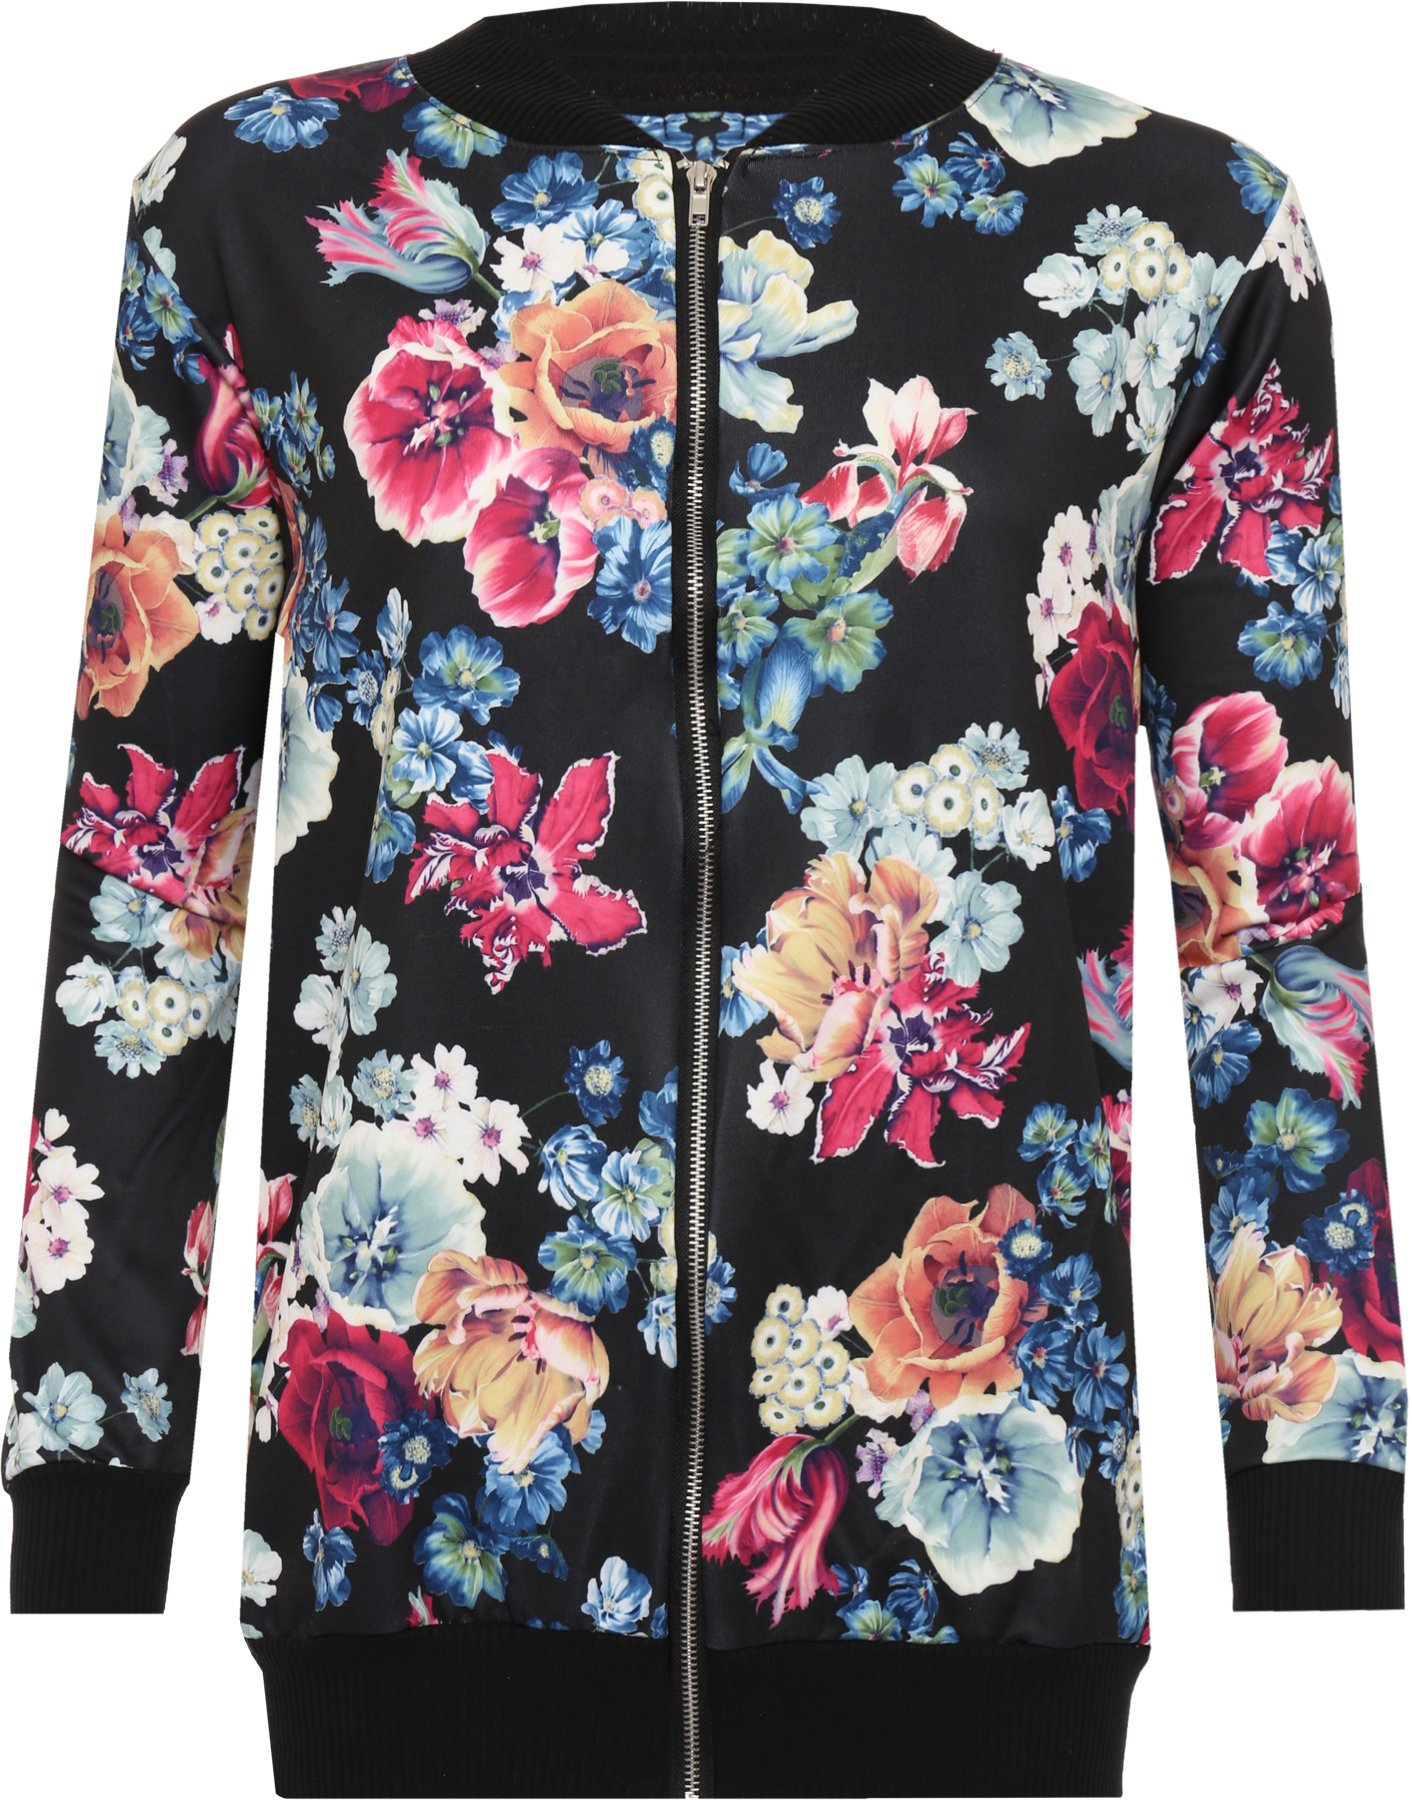 New Womens Black Rose Floral Full Zip Bomber Jacket 14-28